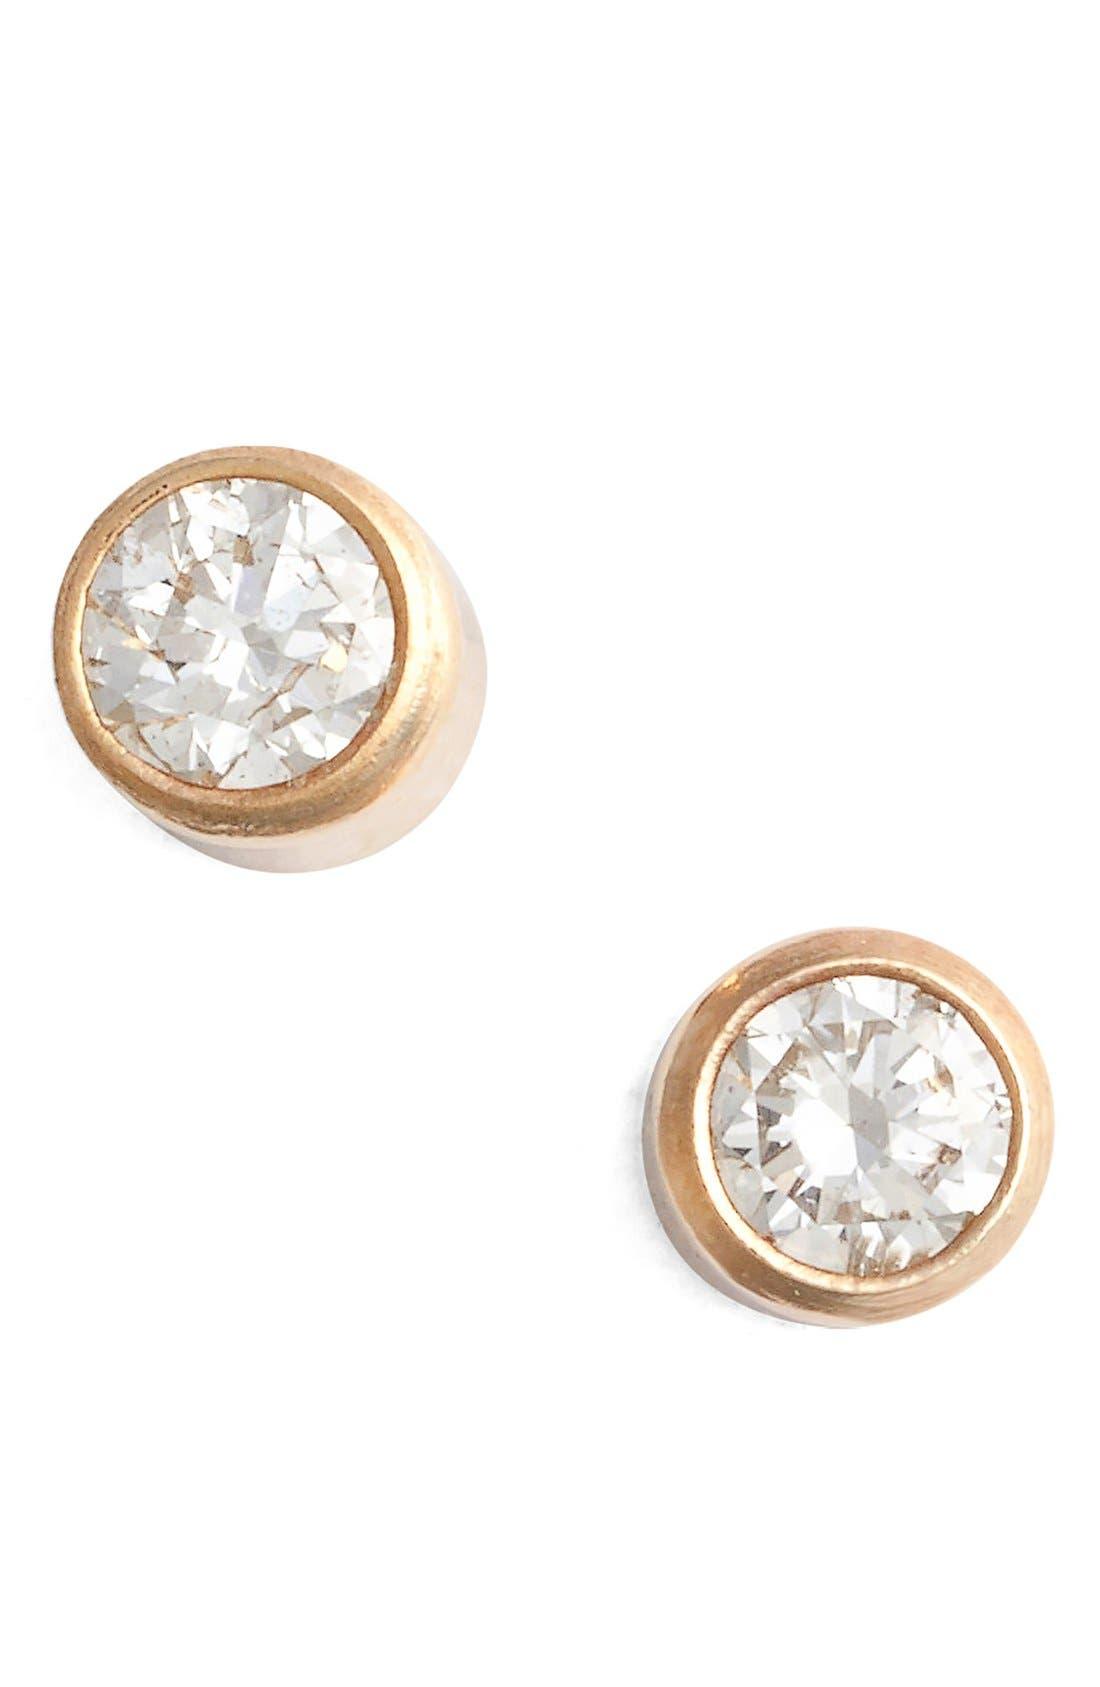 Main Image - Zoë Chicco Diamond Bezel Stud Earrings